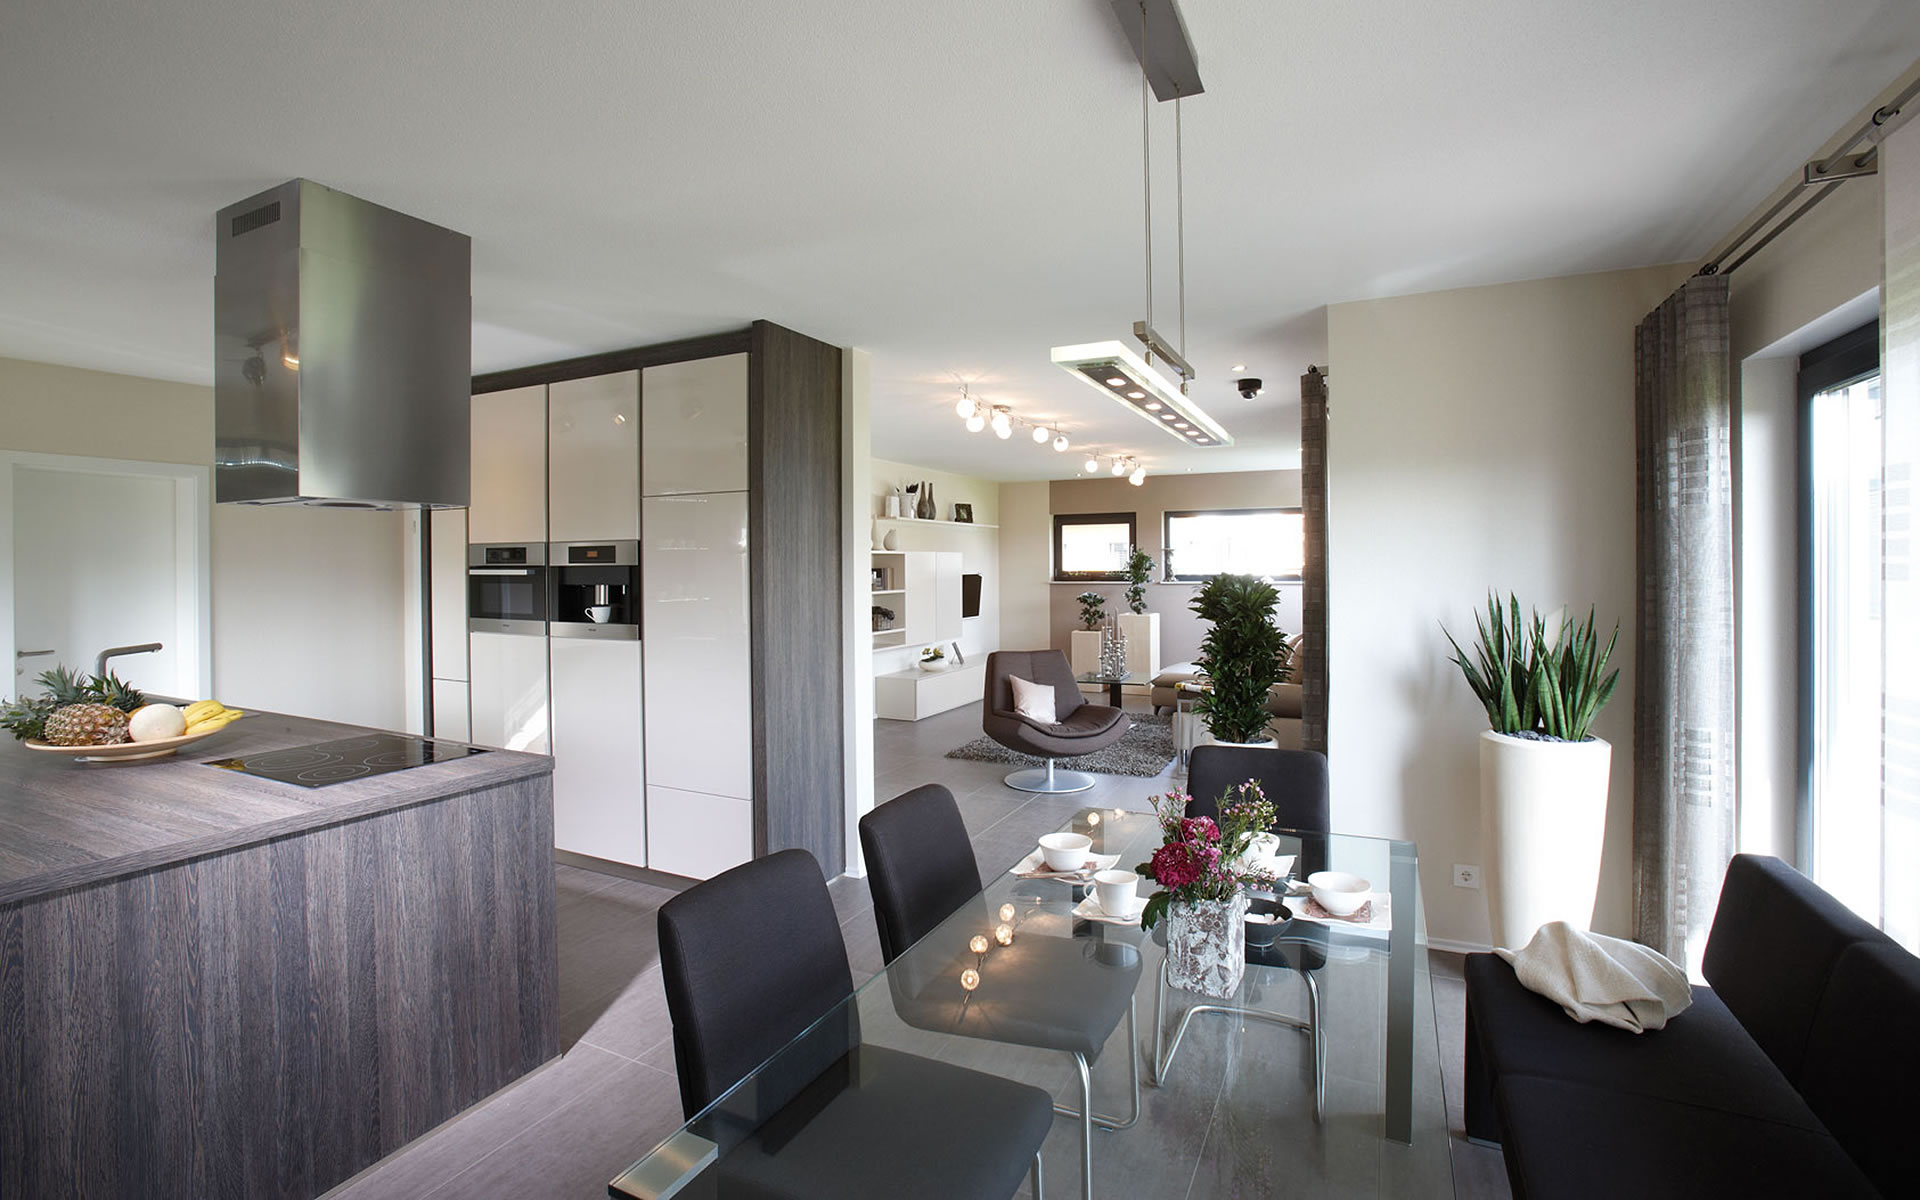 VIO 400 - Musterhaus Köln von FingerHaus GmbH